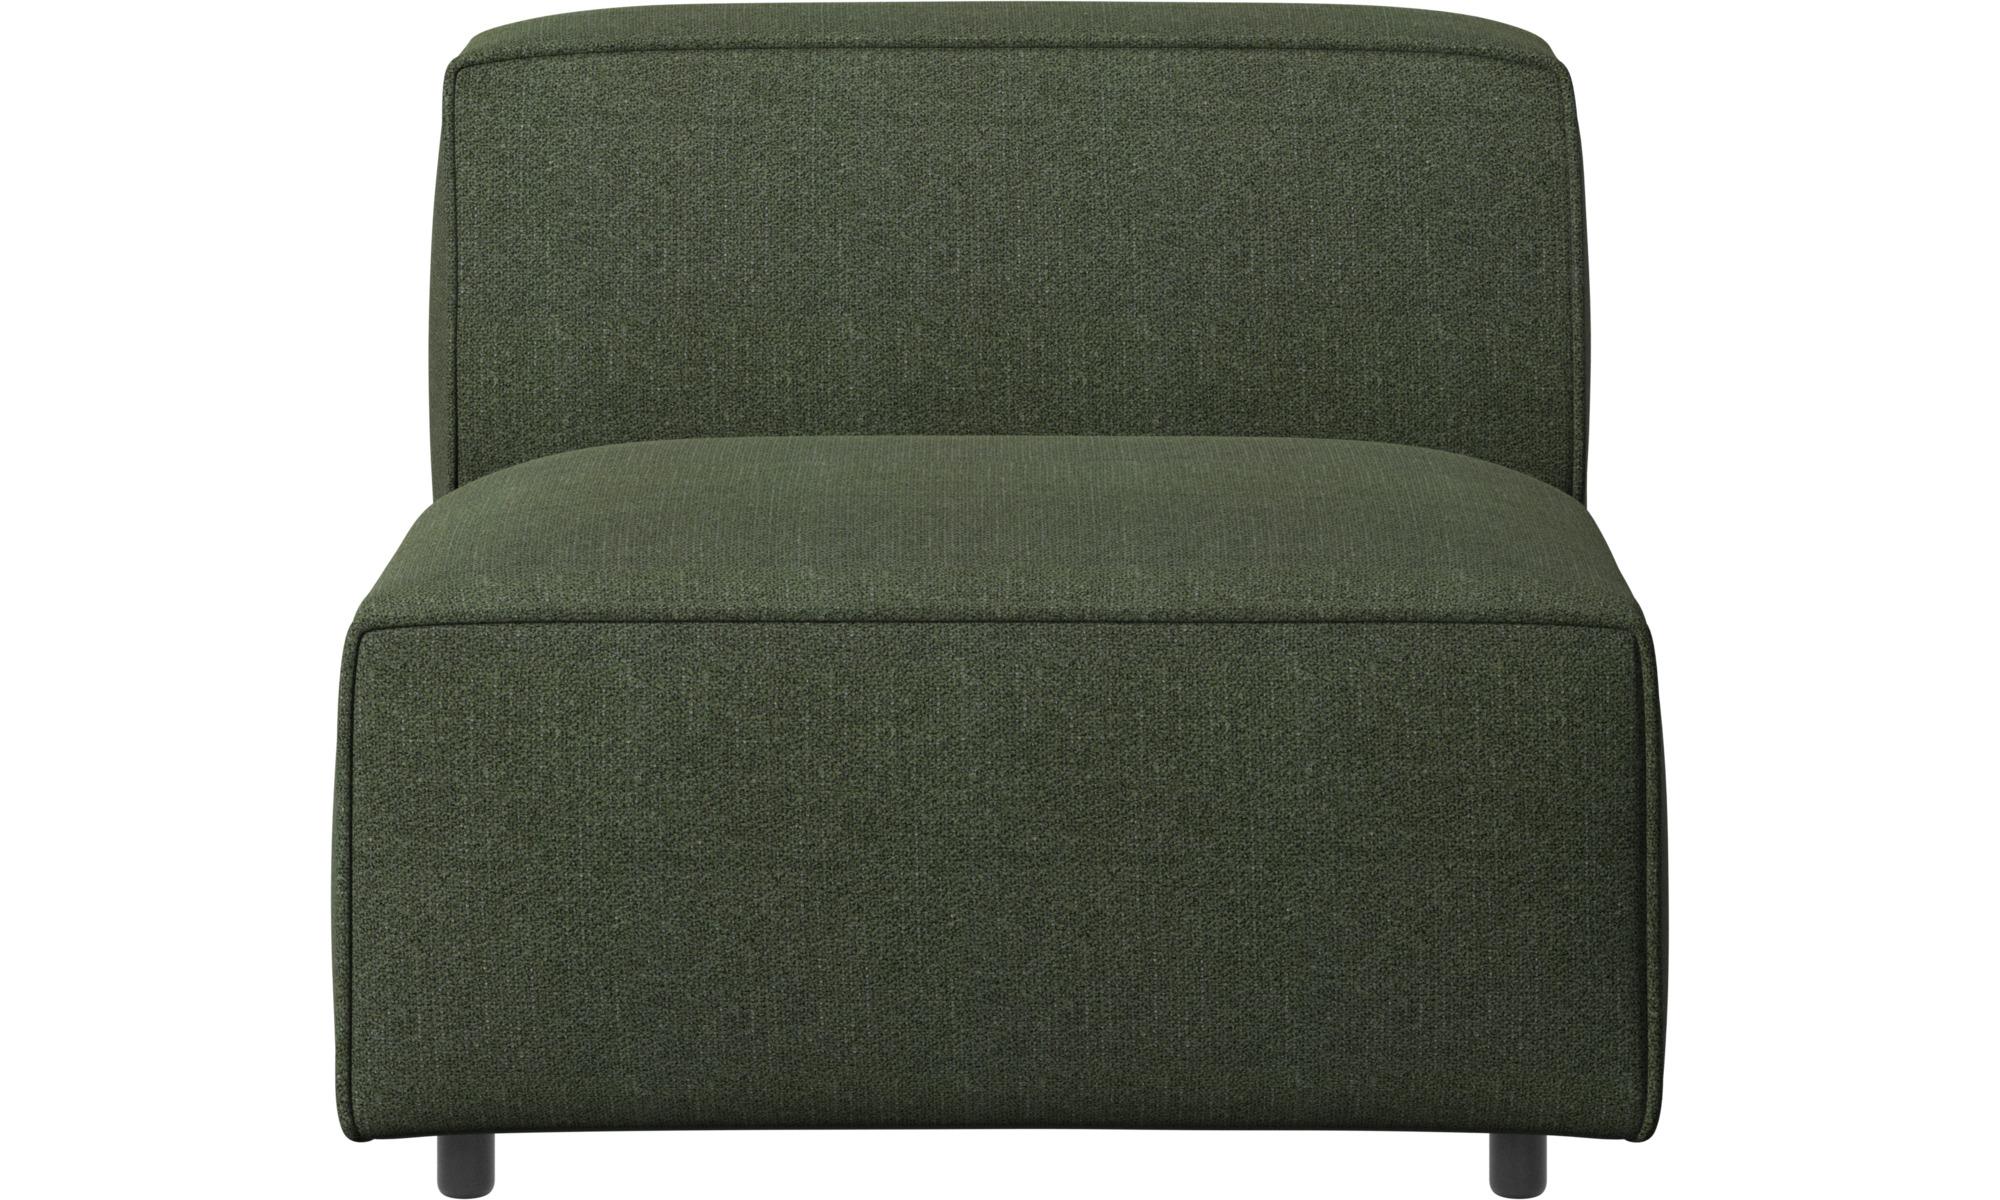 Armchairs - Carmo chair/basic unit - Green - Fabric